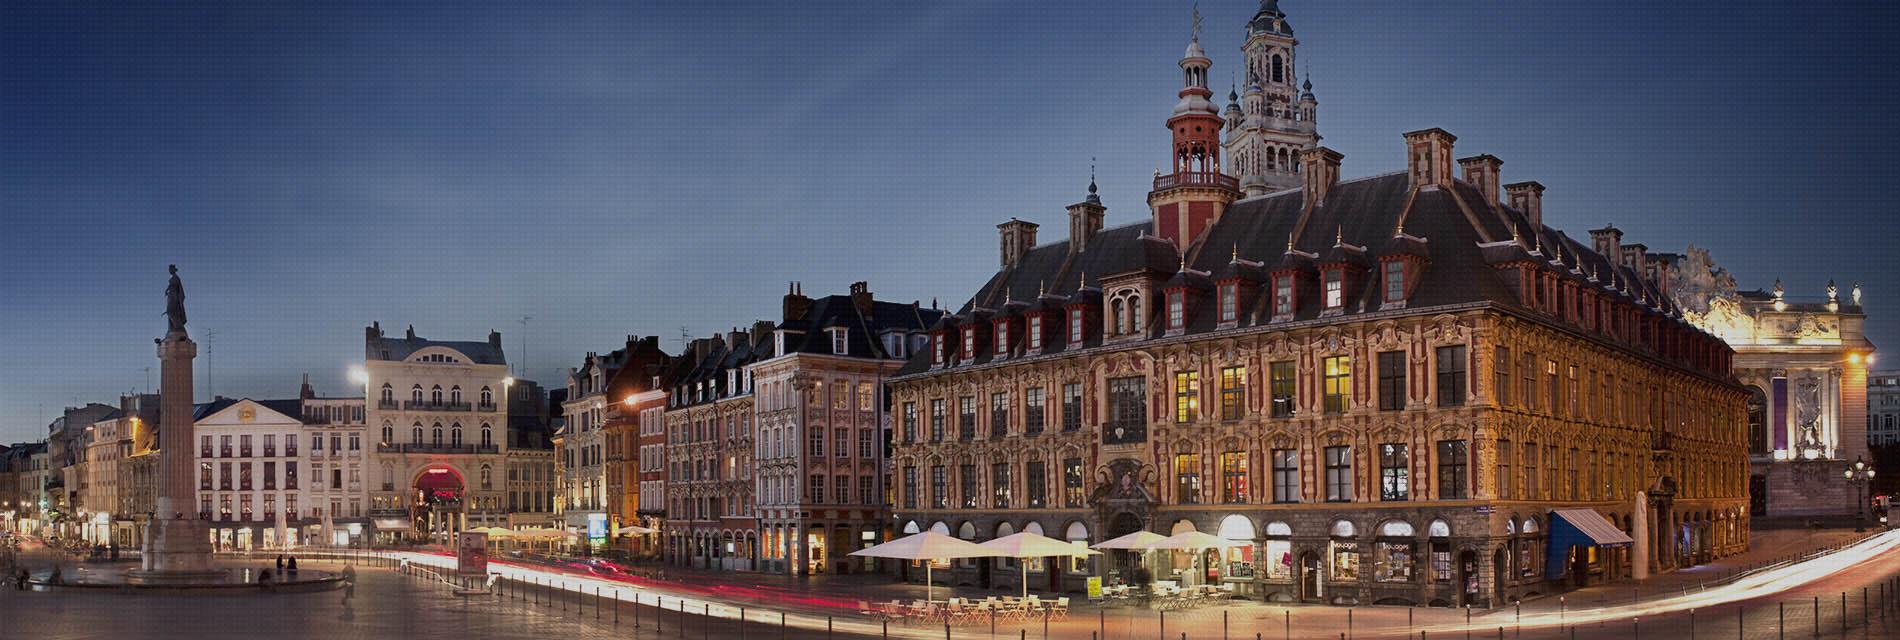 Navette aéroport Lille-Roissy Charles de Gaulle